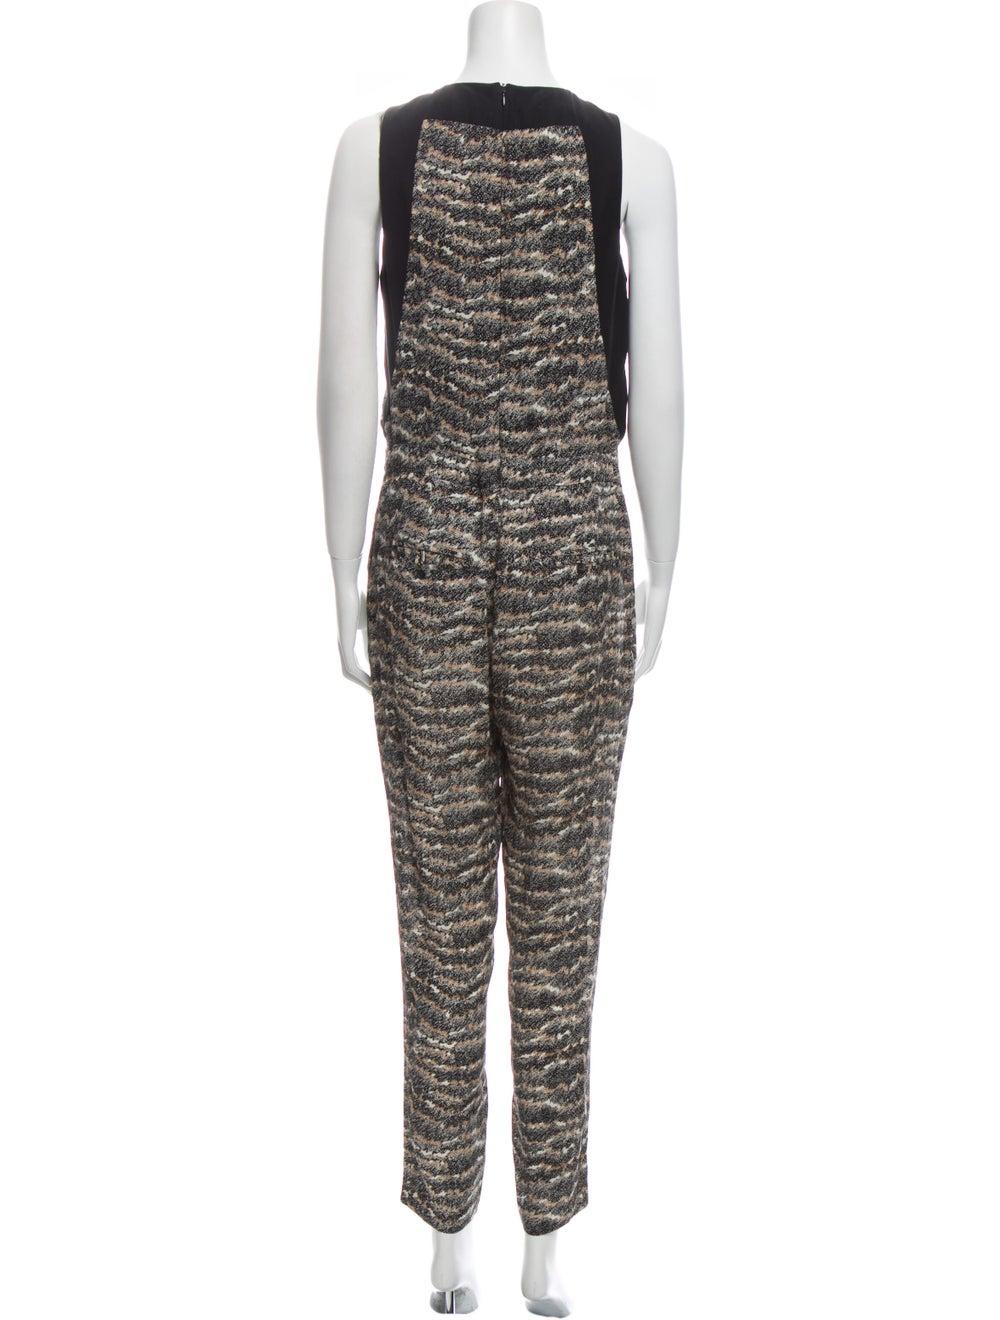 Rag & Bone Silk Printed Jumpsuit - image 3